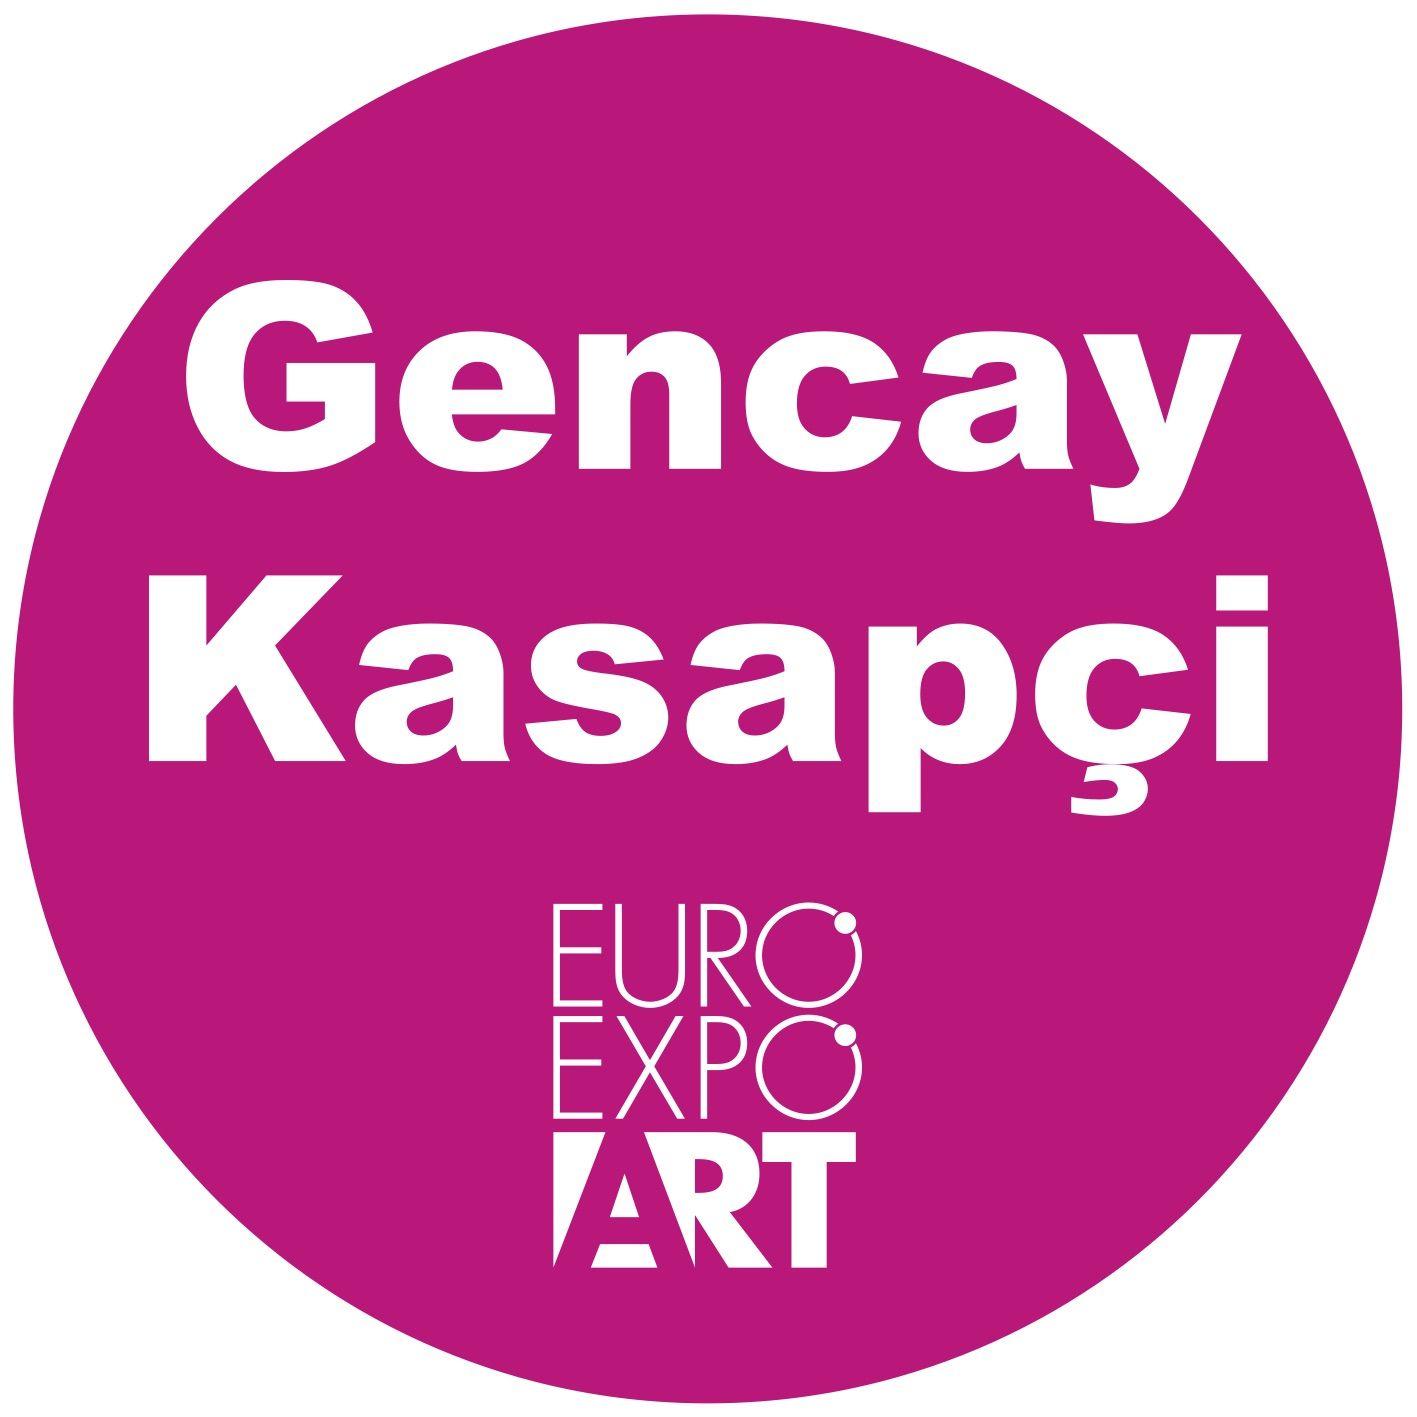 EuroExpoArt 2017 Vernice Forlì Tributo A Gencay Ka